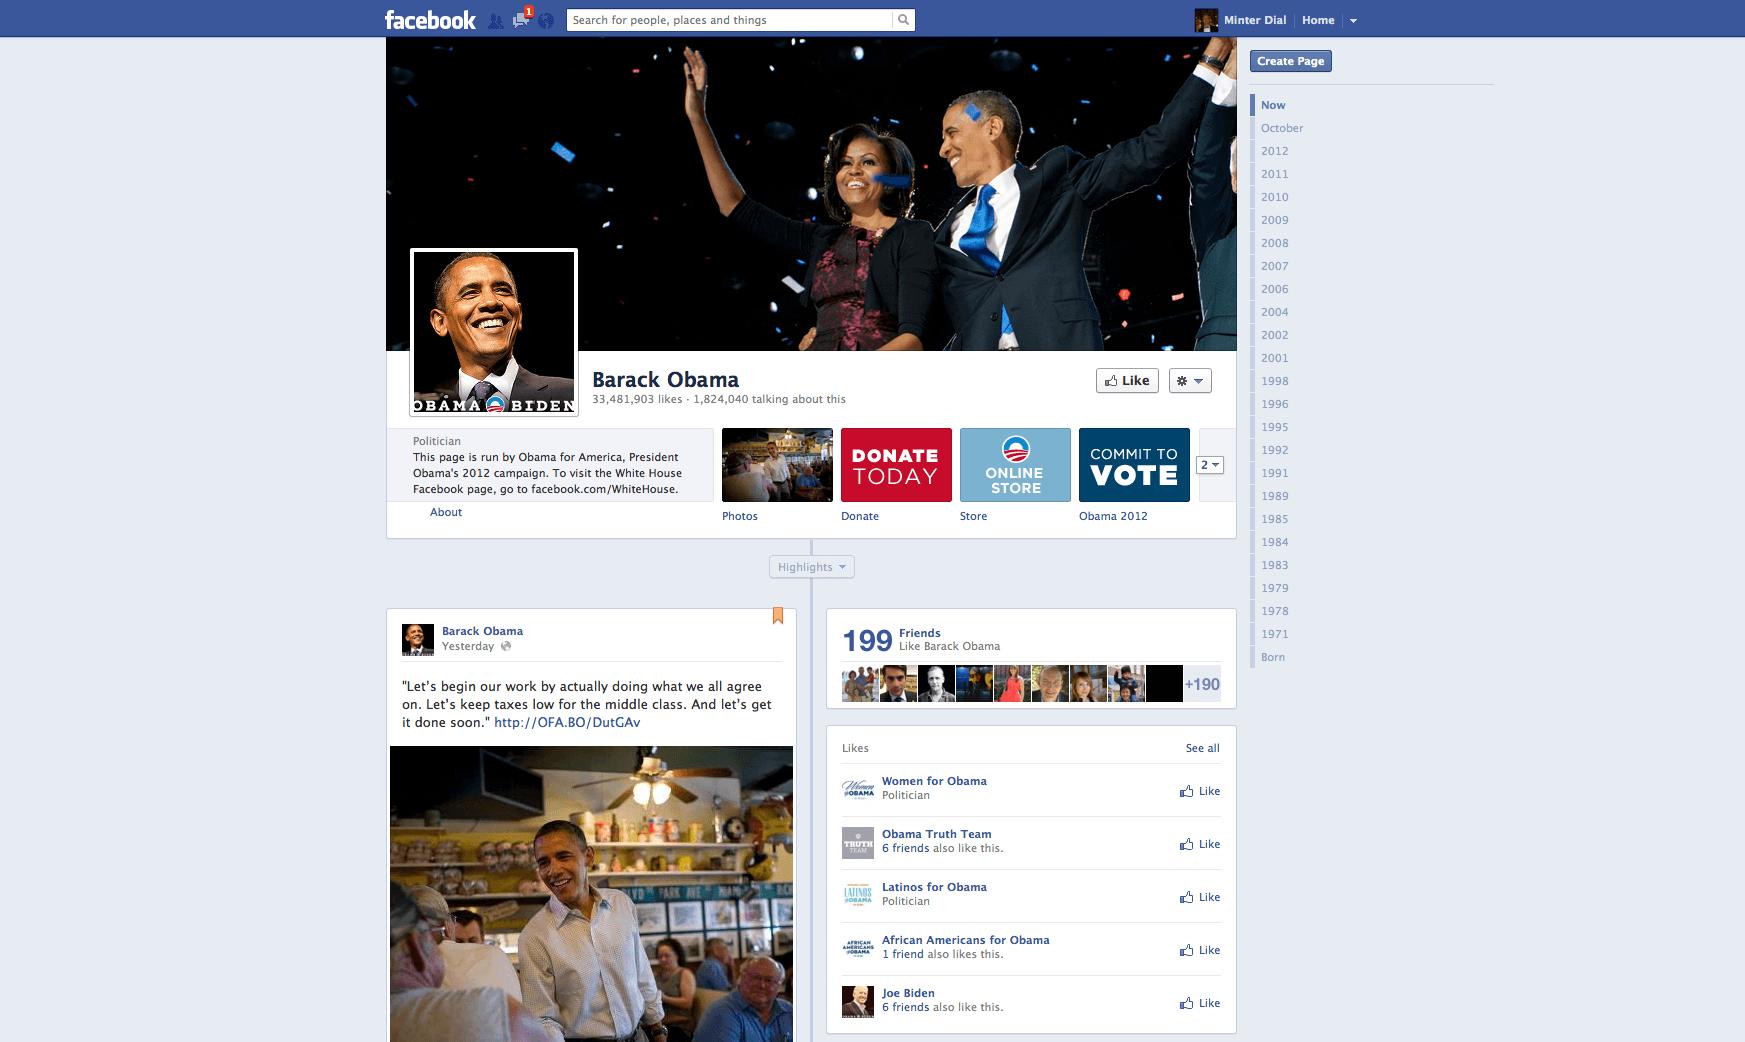 Obama Facebook page, The Myndset Digital marketing and brand strategy